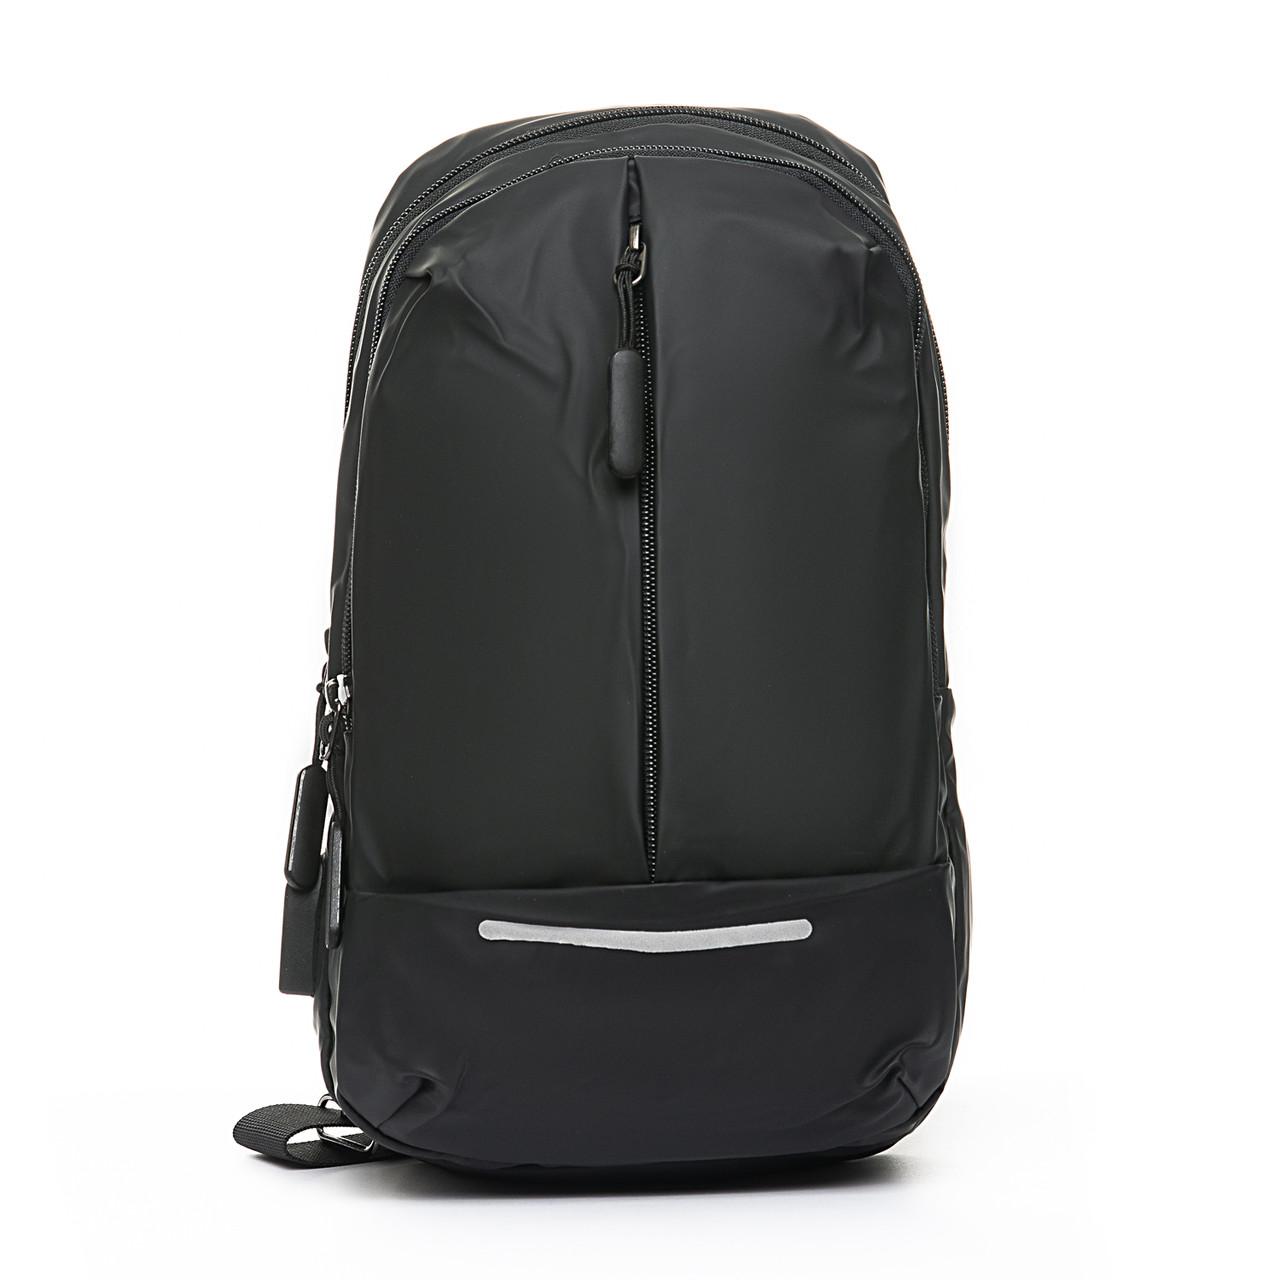 Мужская сумка через плече Lanpad 18 x 32 x 10 см Черный (4066/1)